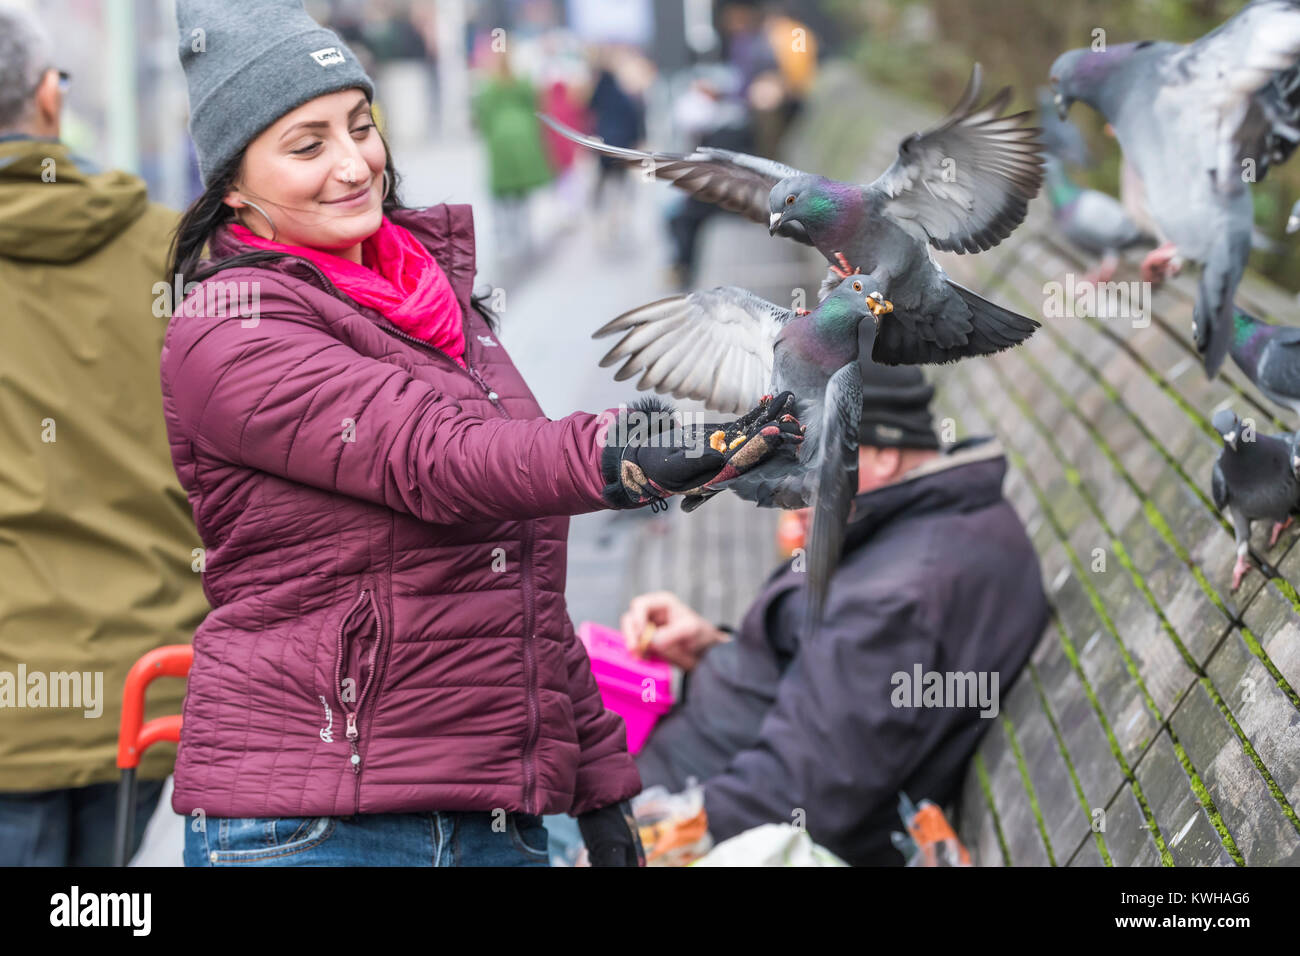 woman-feeding-feral-pigeons-columba-livia-domestica-in-the-city-of-KWHAG6.jpg